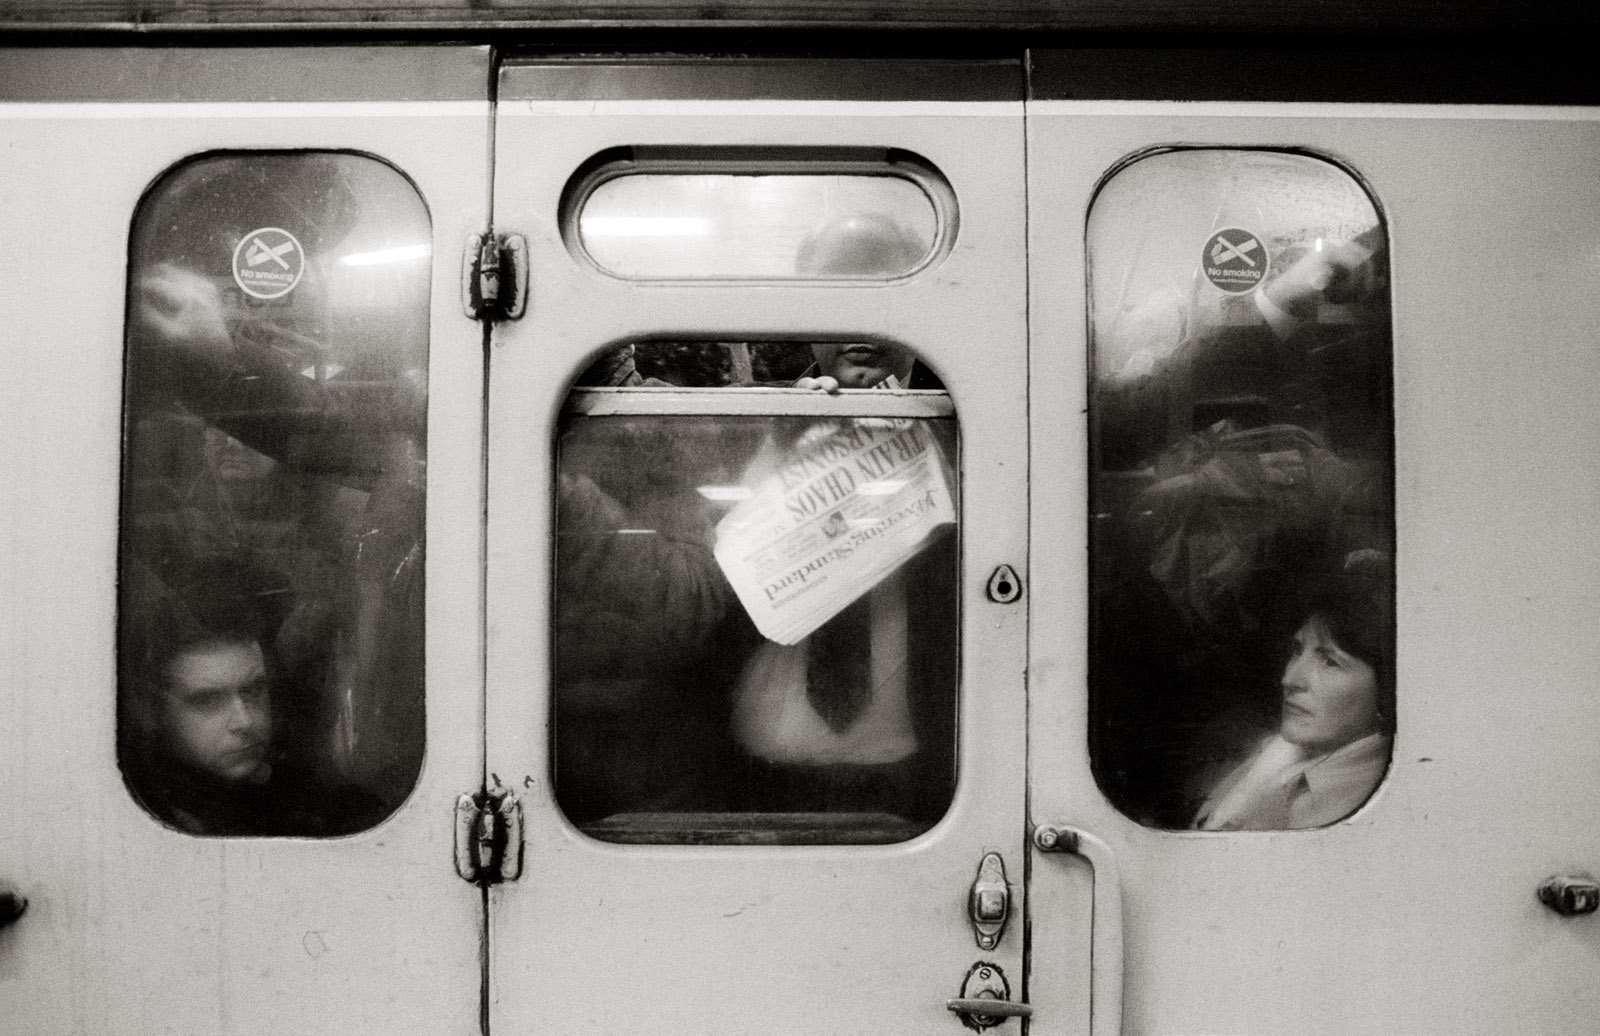 All rights reserved © Tomas Bertelsen